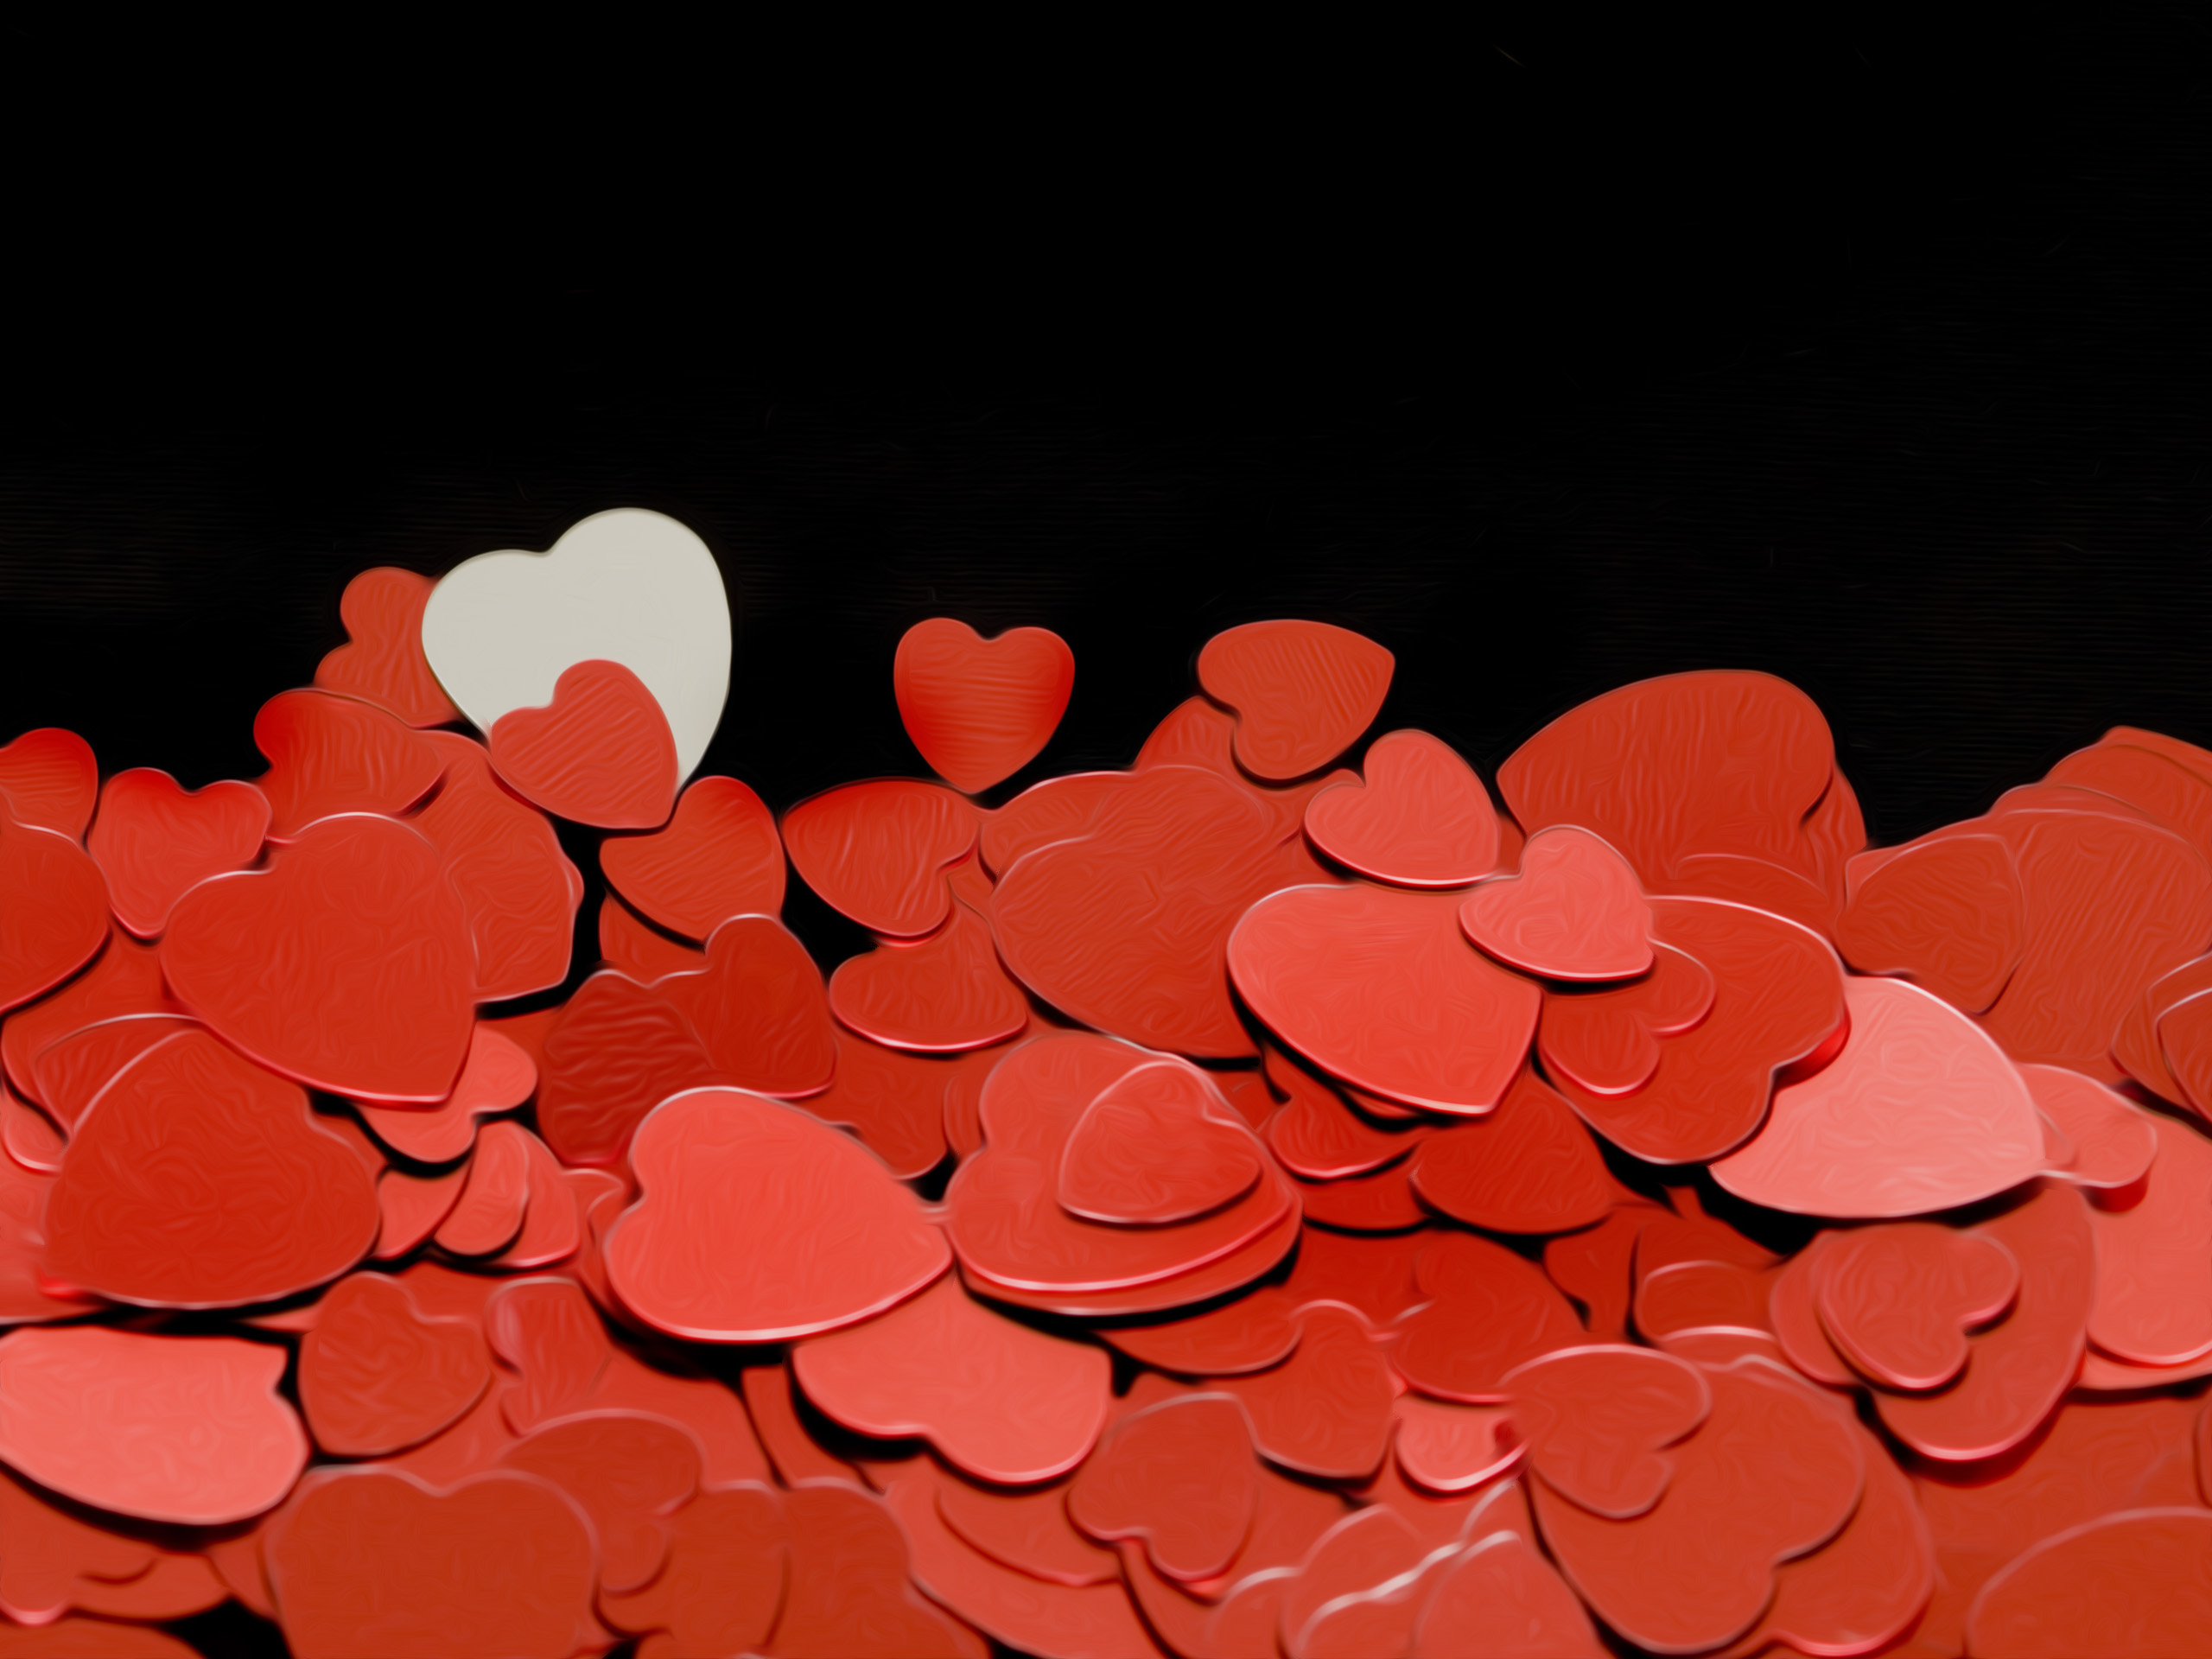 Disney Valentine Desktop Wallpaper - WallpaperSafari